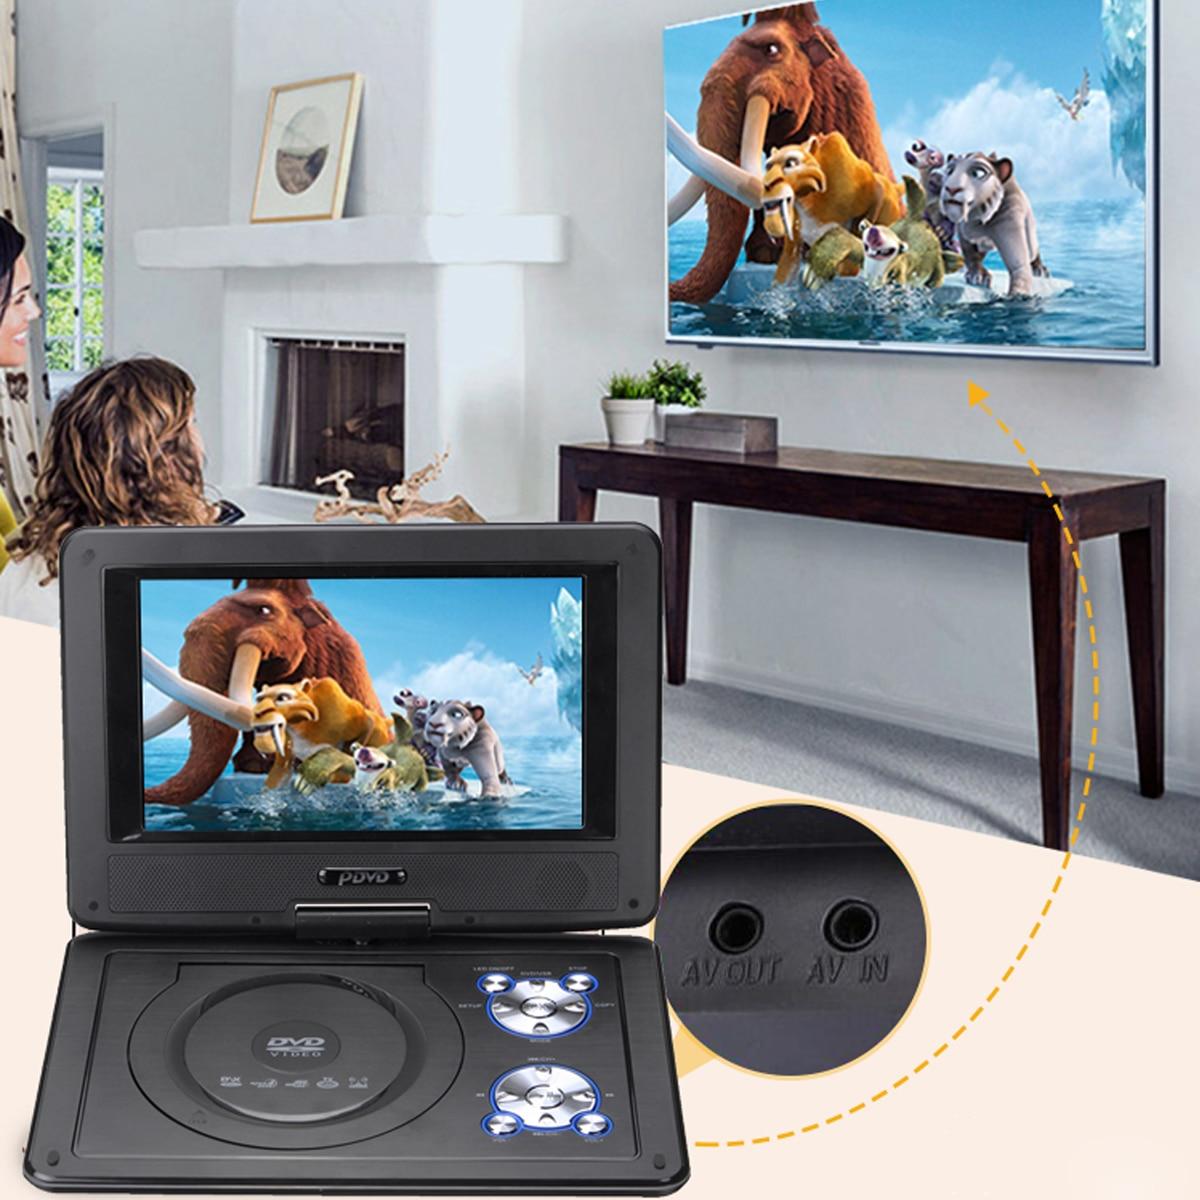 9,8 дюймов портативный DVD плеер 270 градусов вращающийся TFT ЖК-дисплей Экран FM VCD CD MP3 плеер для DVD ТВ автомобиля Зарядное устройство